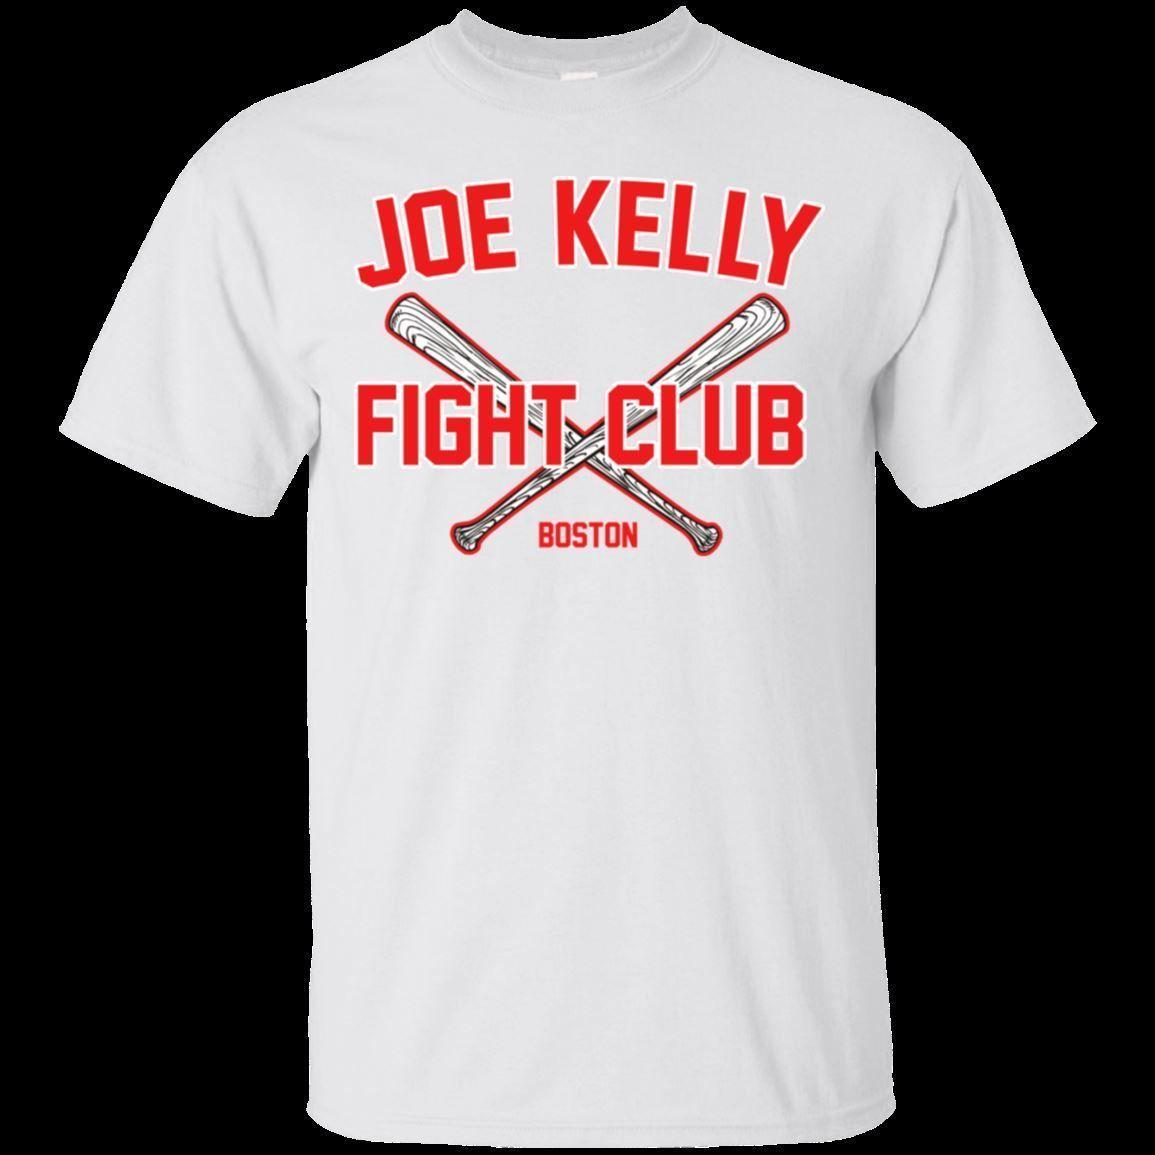 Joe Kelly Fight Club T Shirt Joe Kelly Boston Baseball Men S Tee Shirt  Humorous T Shirt Cool And Funny T Shirts From Goodencounter60 ce135ef793e